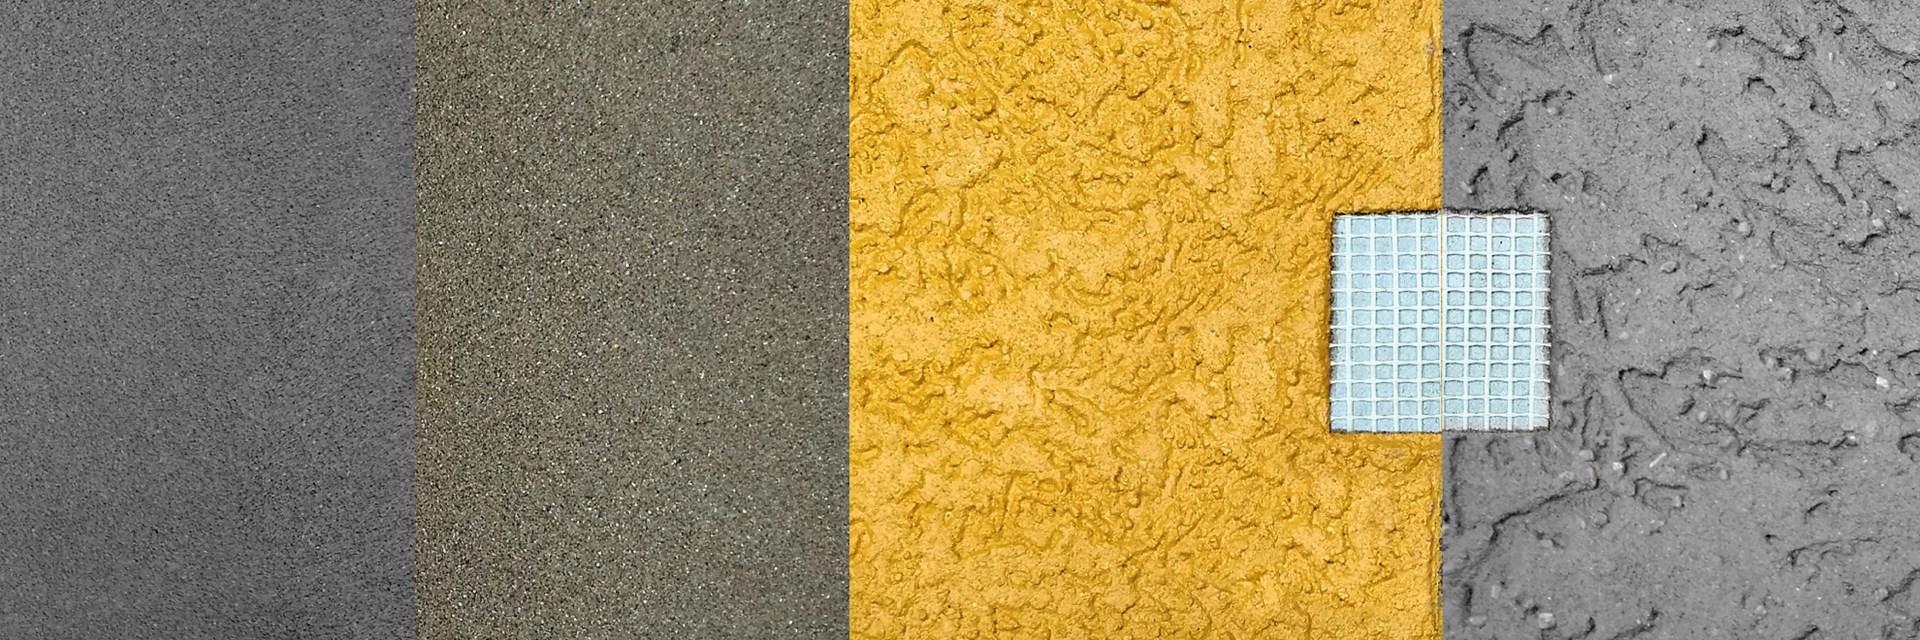 textura-terminaciones-permanit